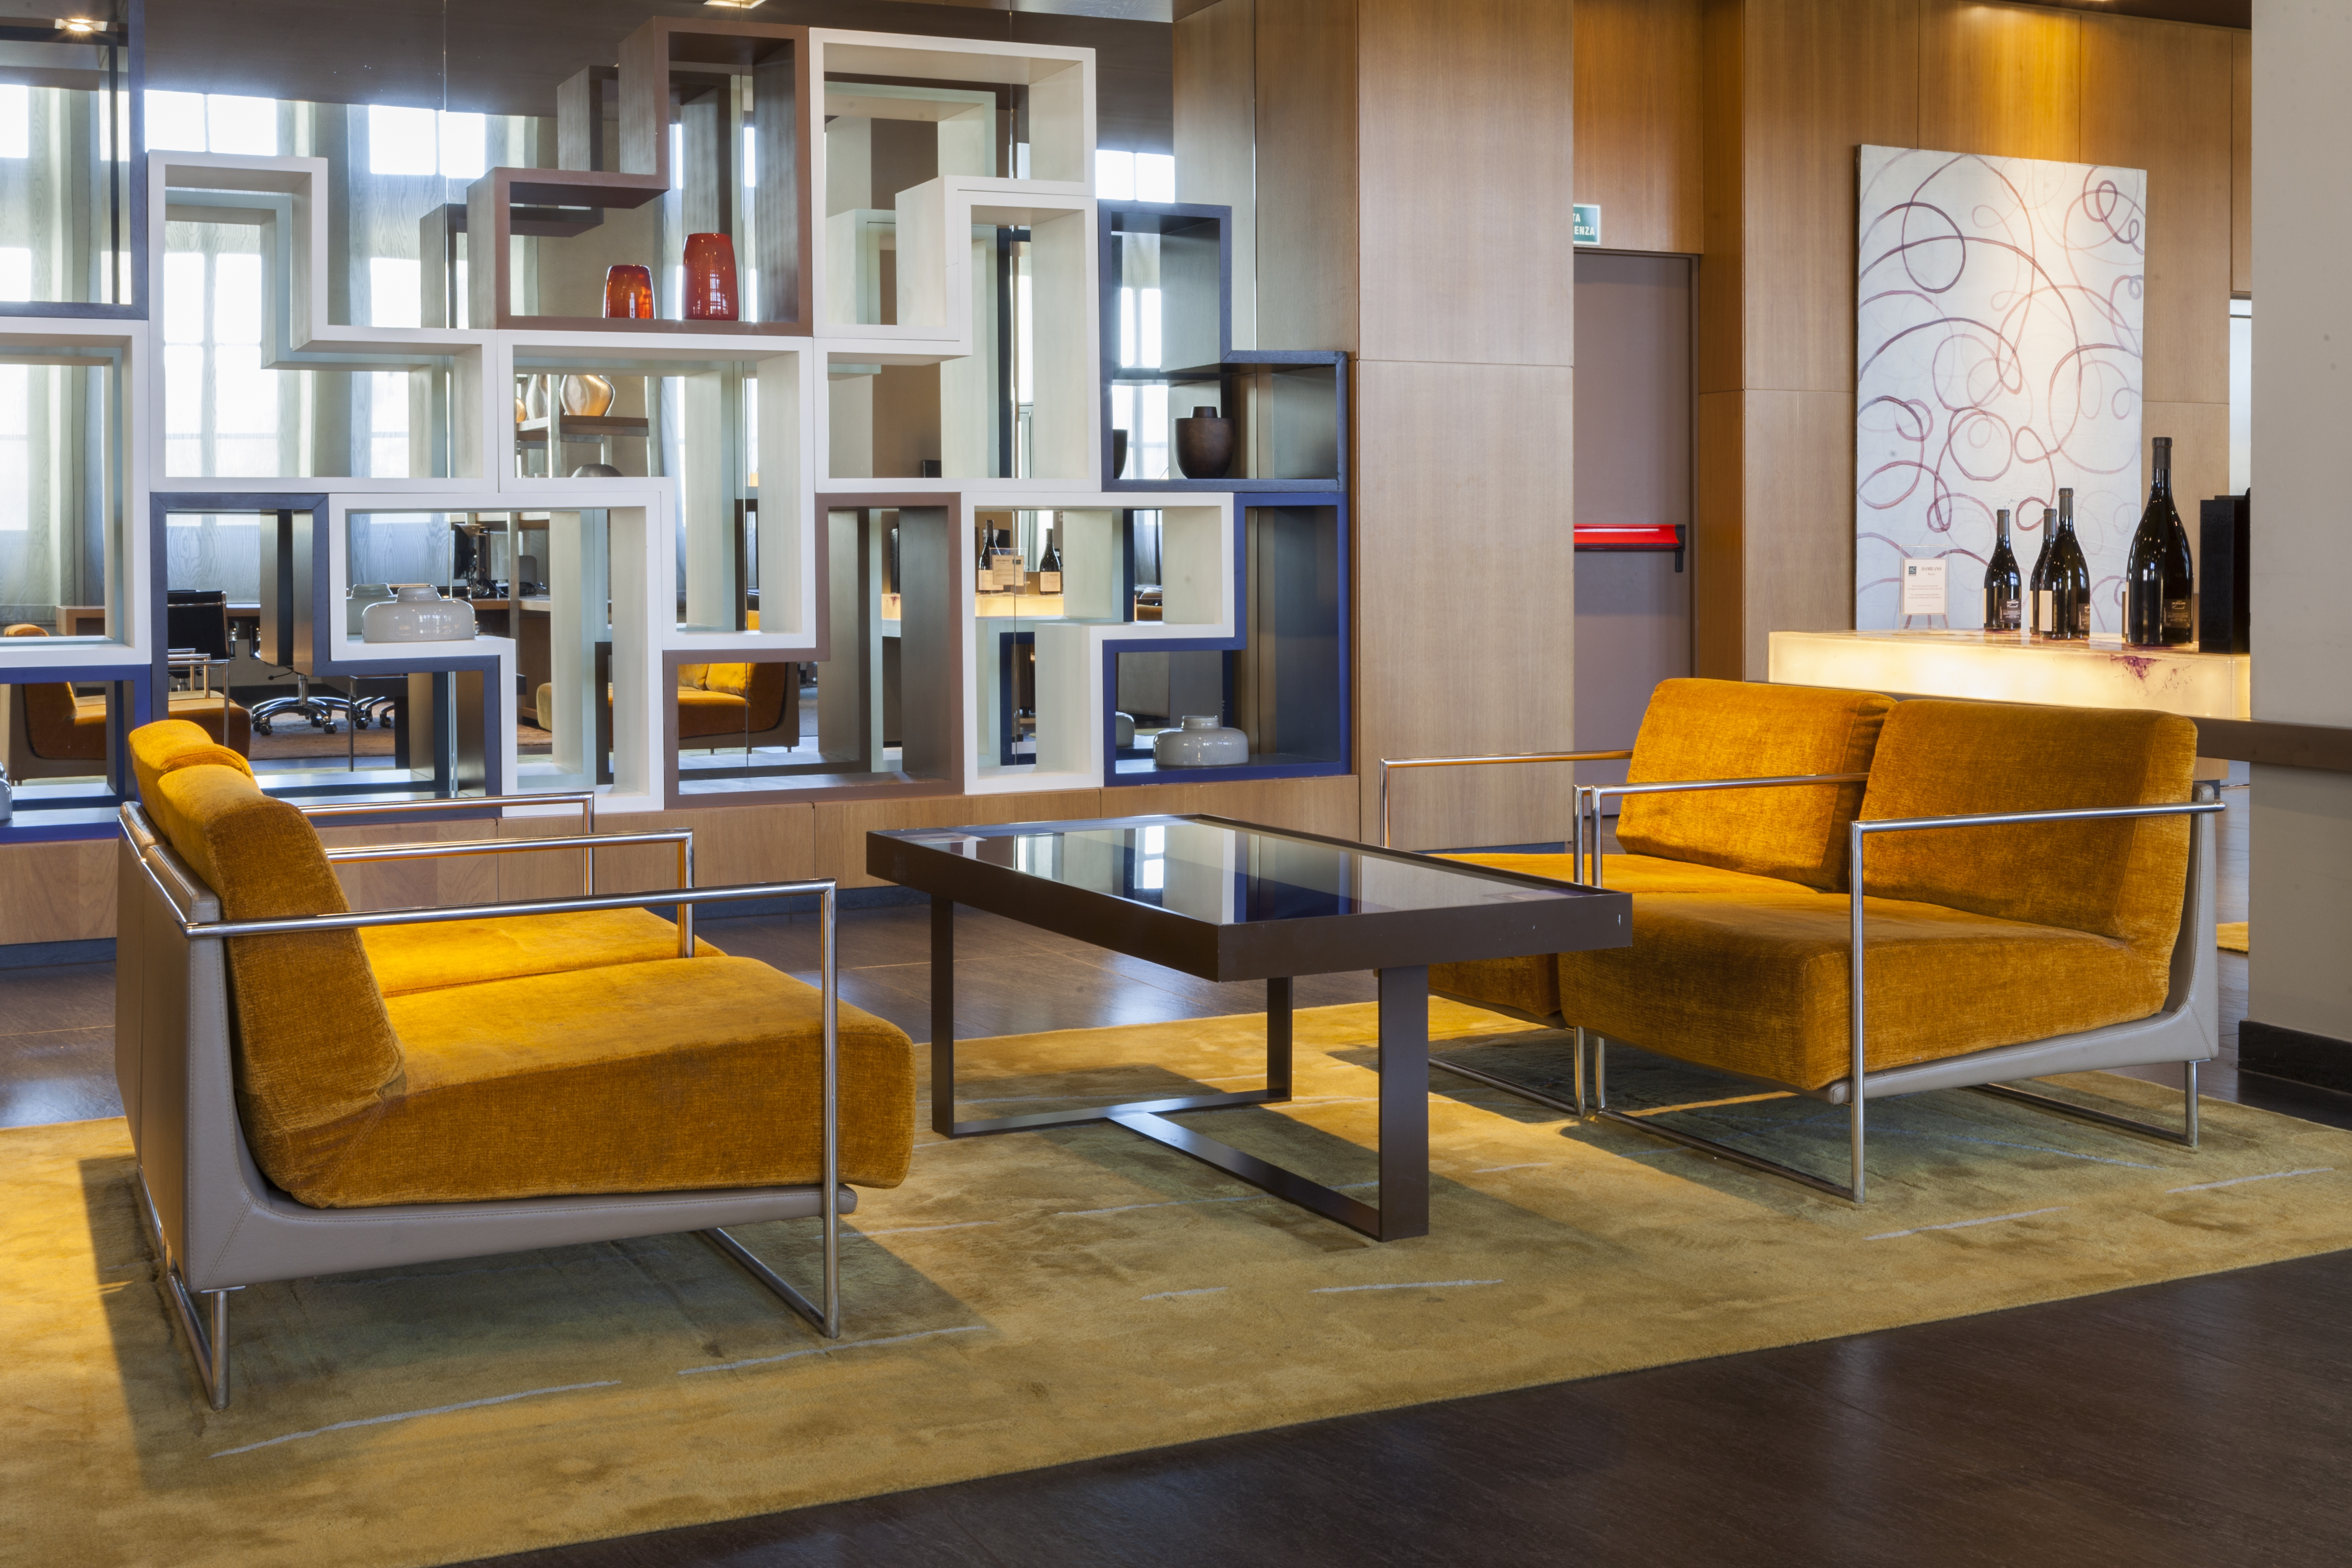 Ac hotel torino turismo torino e provincia convention for Hotel design torino